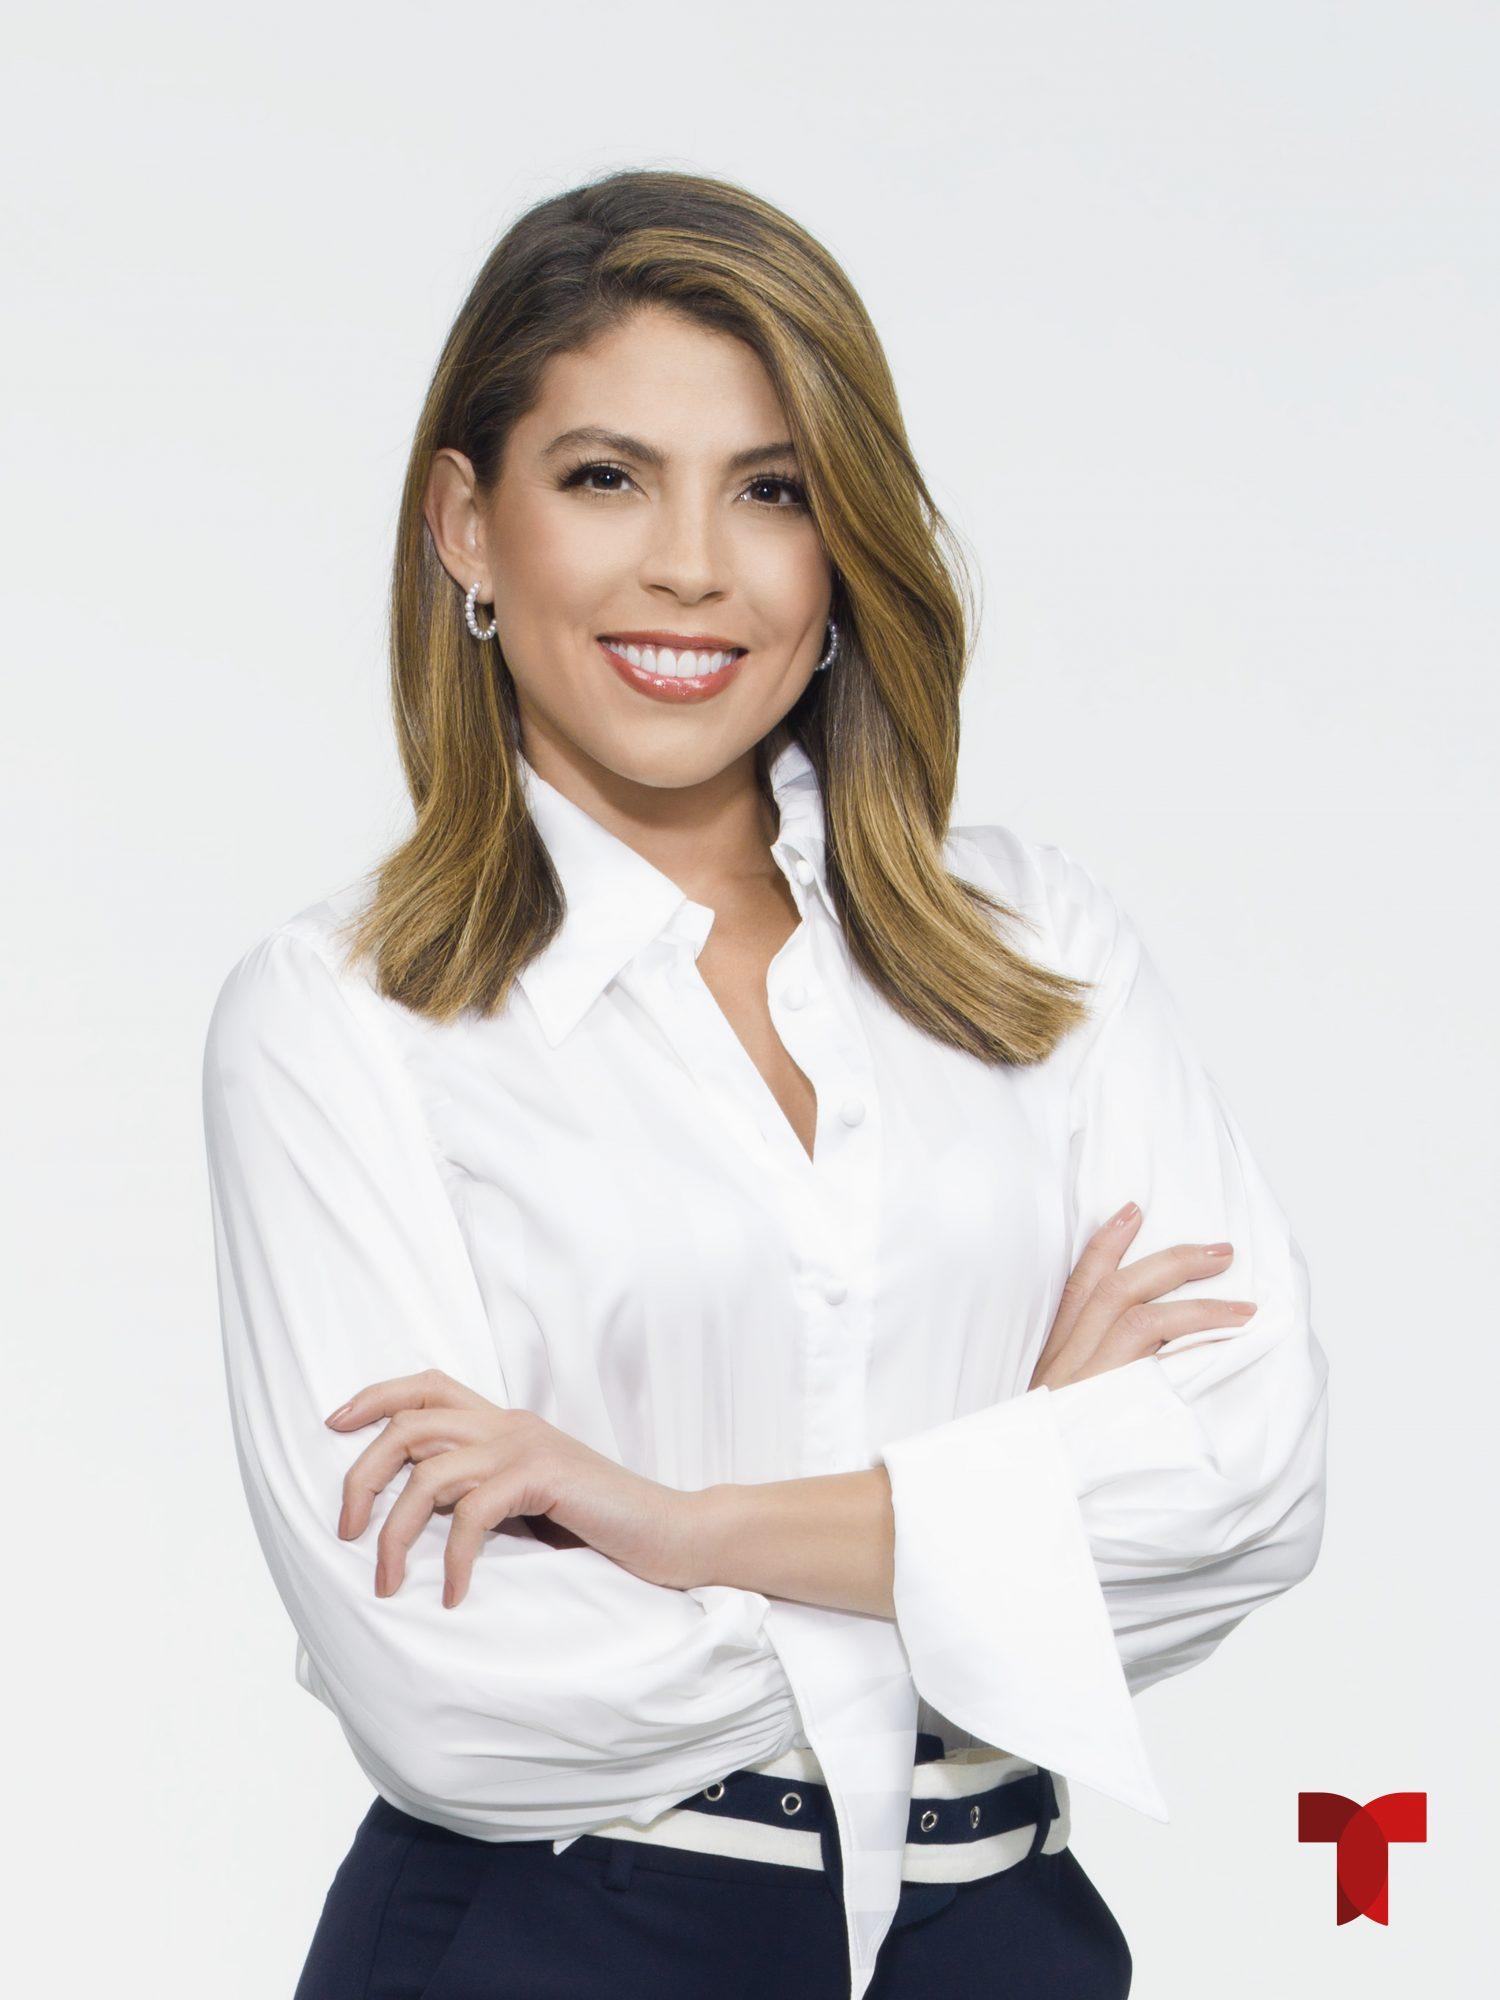 Nicole Suárez